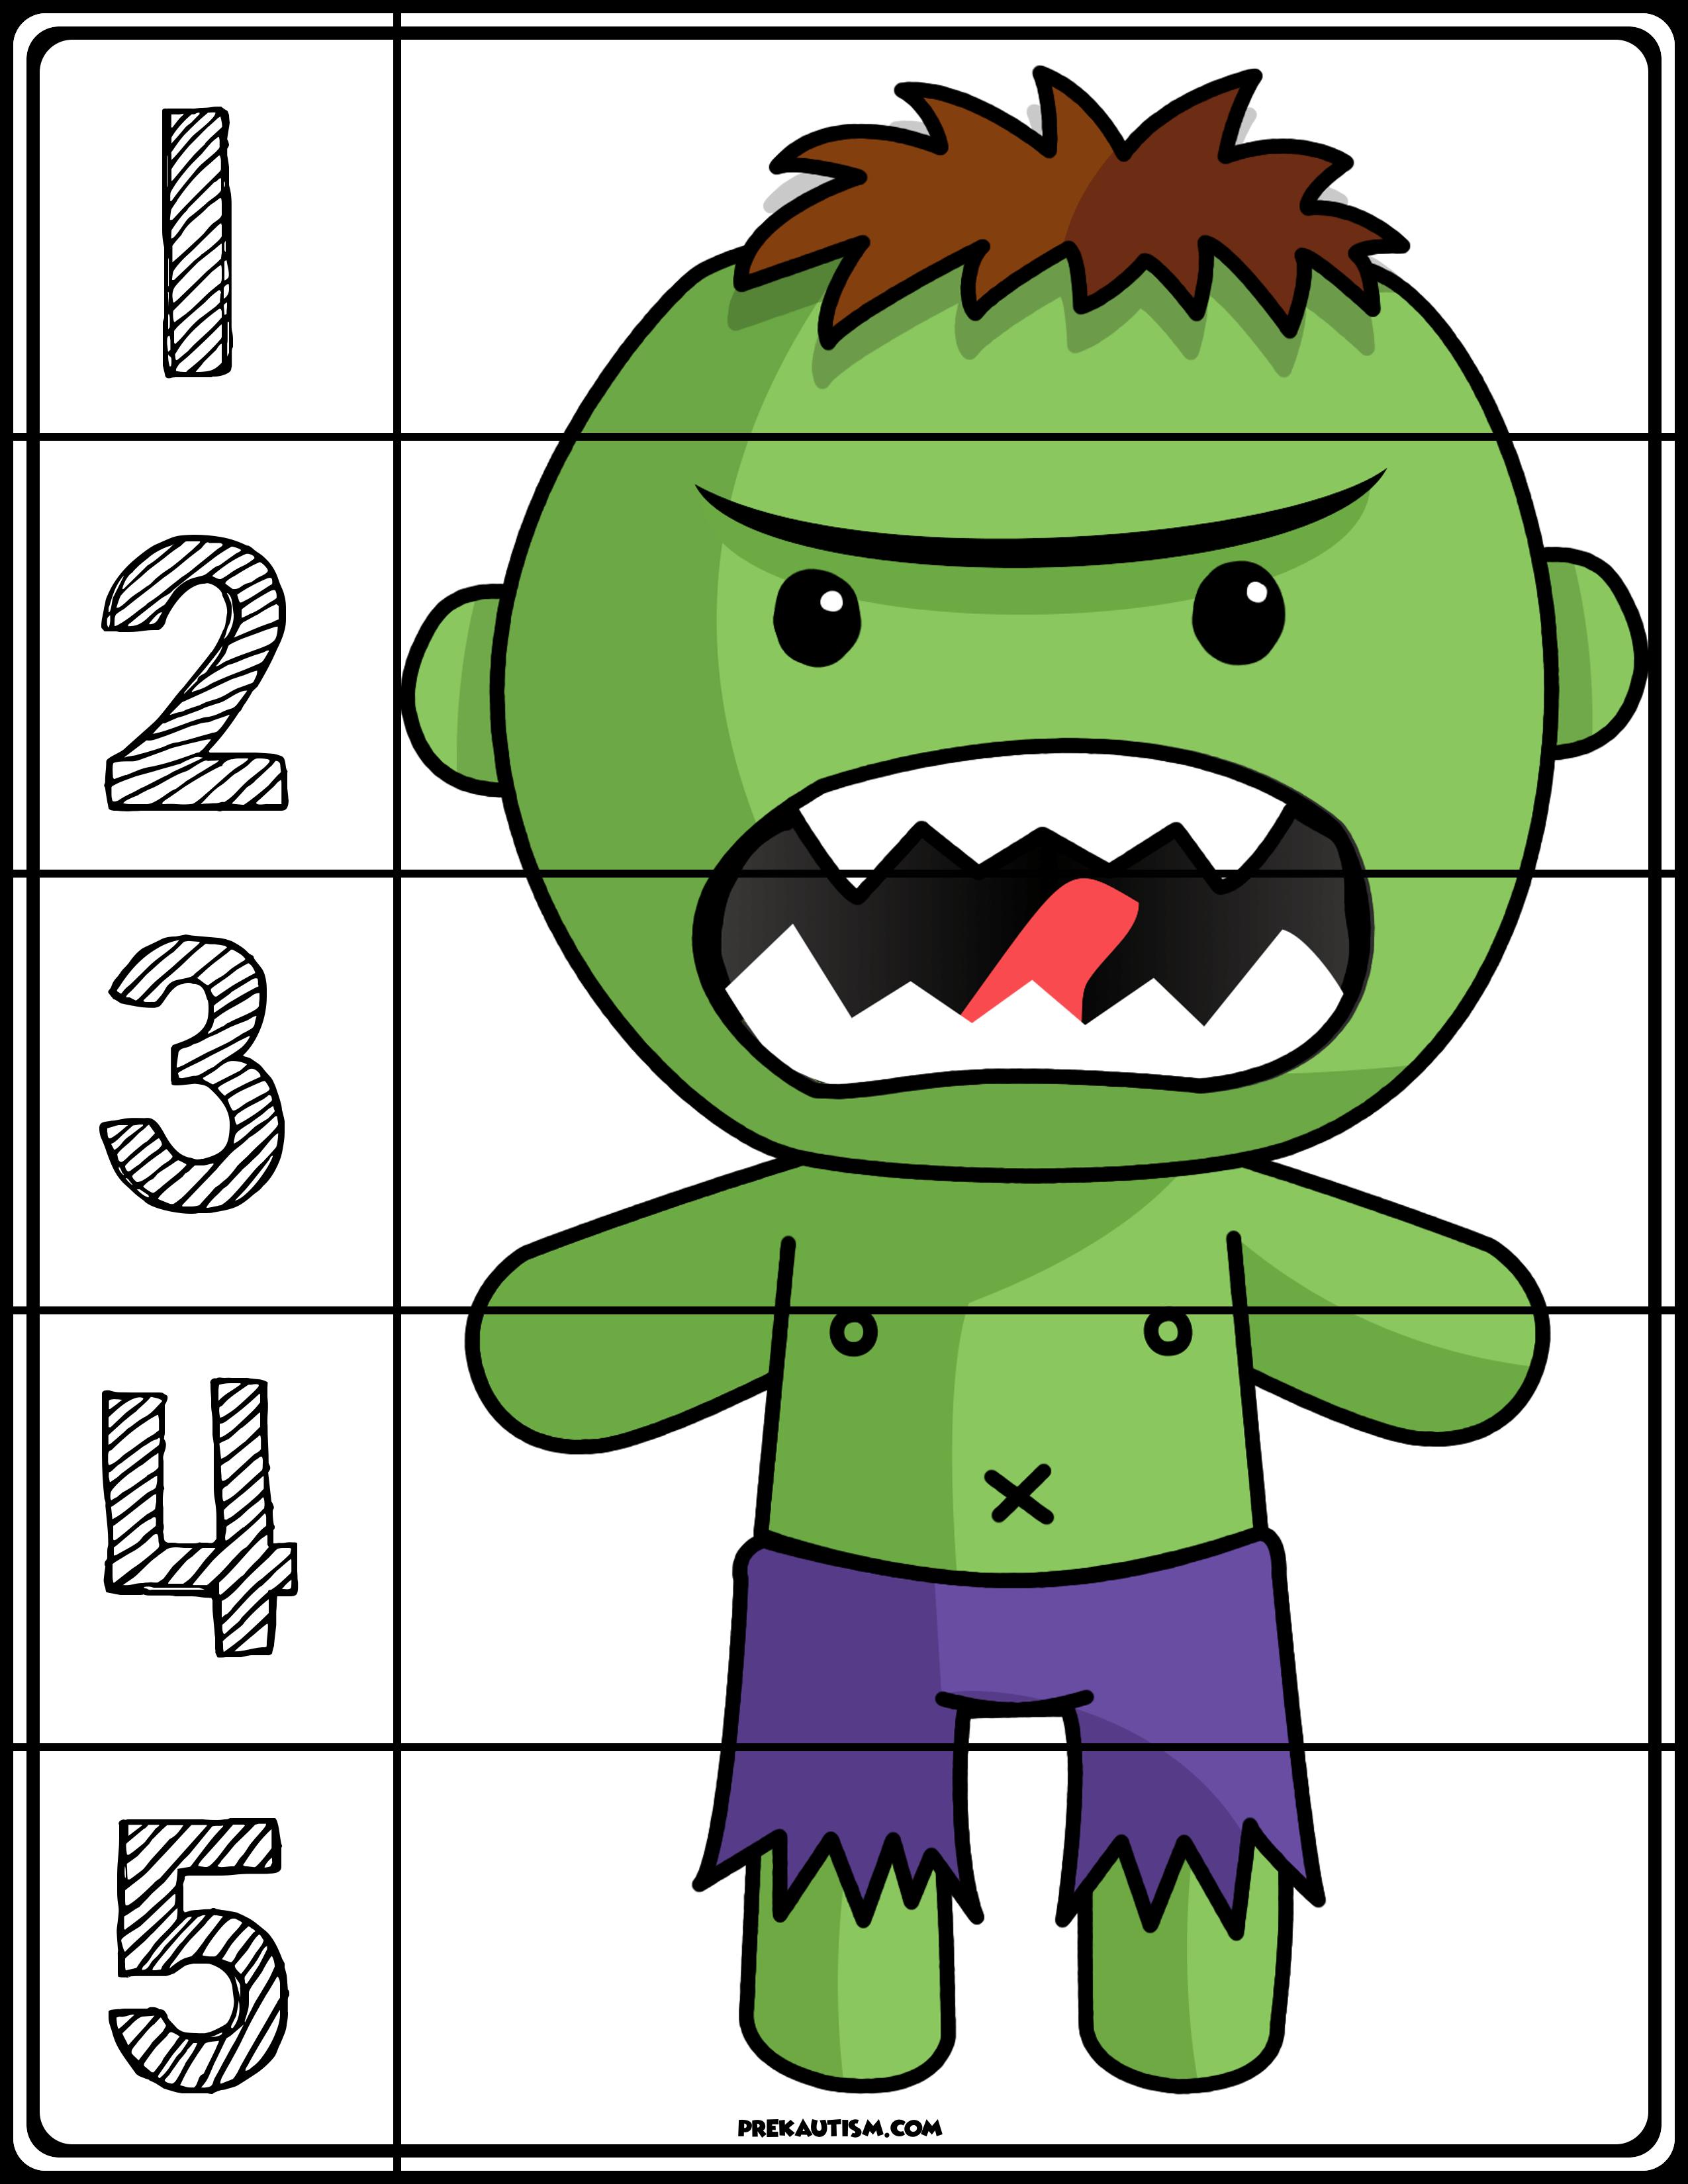 Predownload: Free Superhero Number Puzzles Number Puzzles Super Hero Activities Superhero Preschool [ 3300 x 2550 Pixel ]